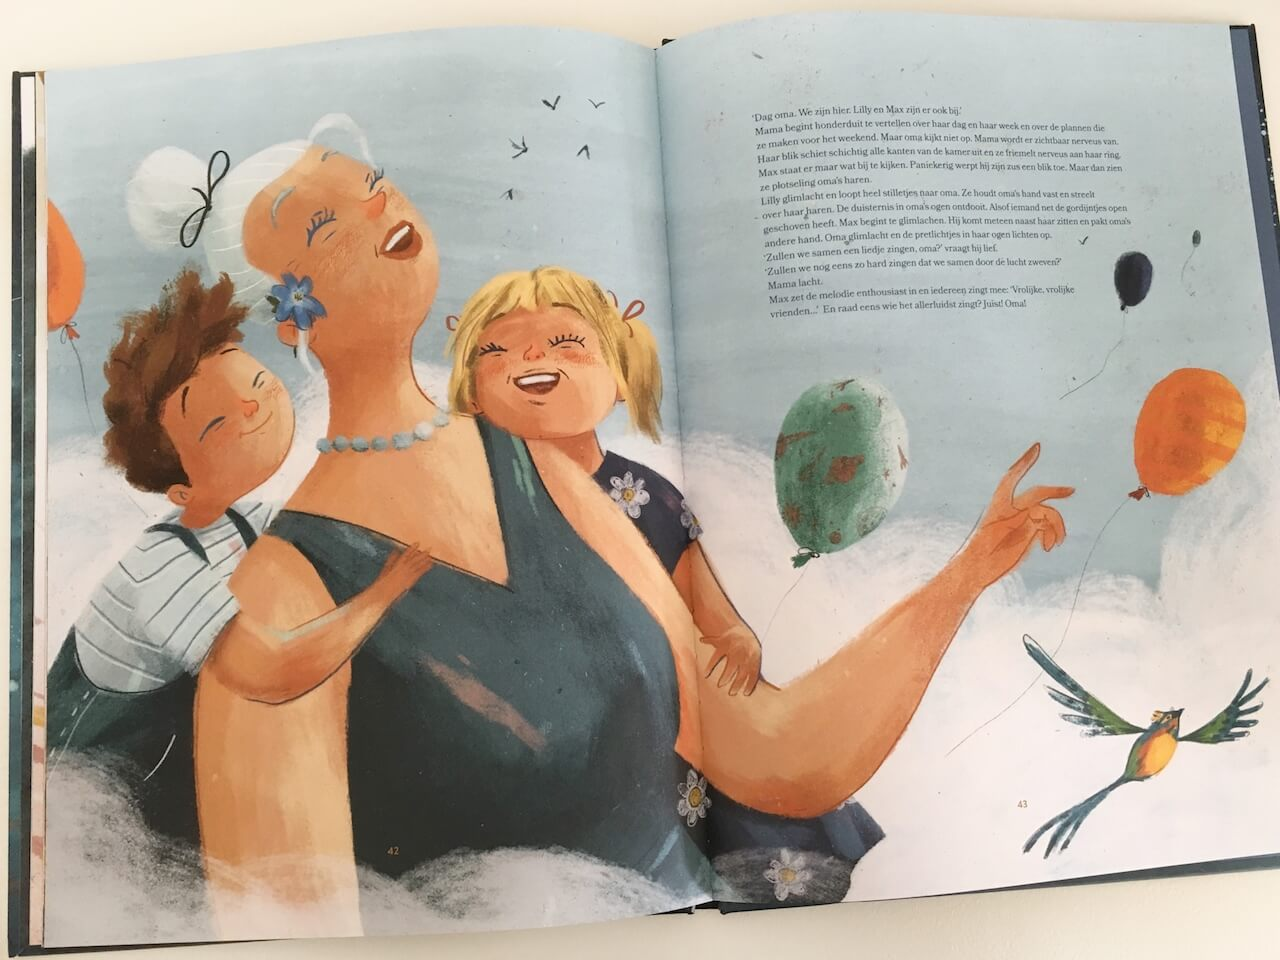 FullSizeRender 177 - Wondermooi boek voor kinderen over Alzheimer